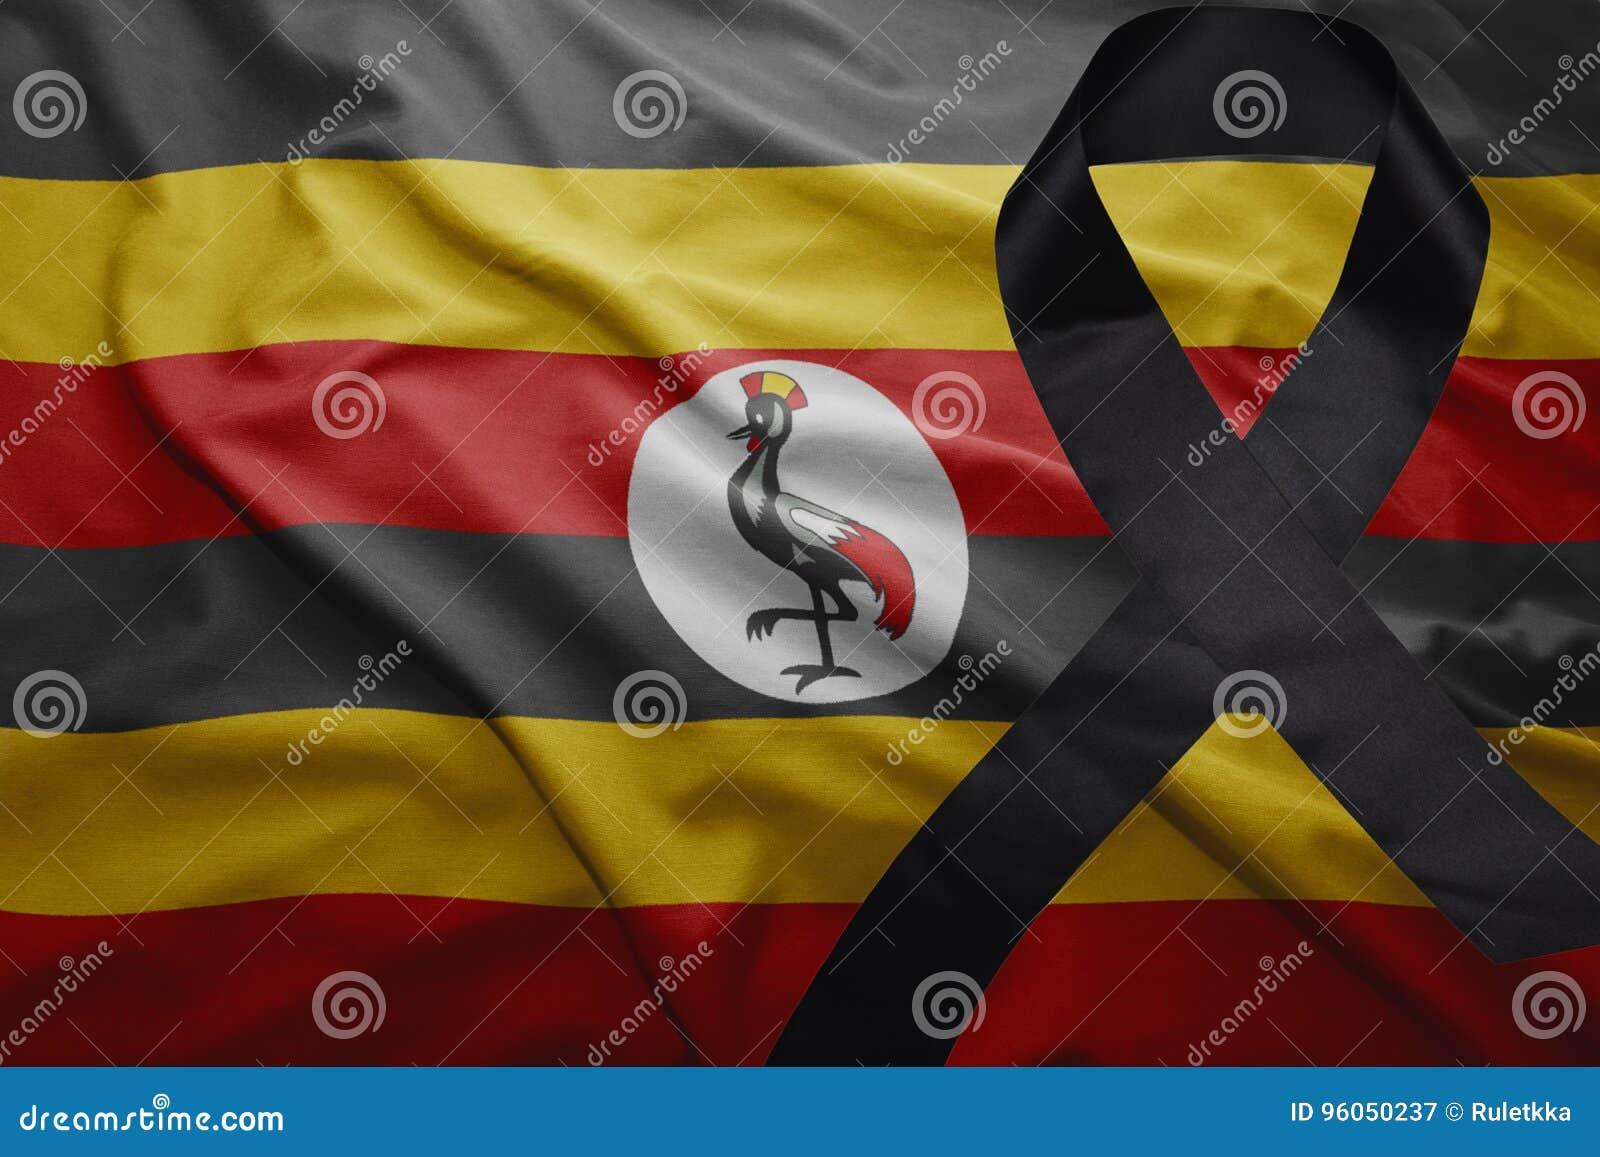 Drapeau de l Ouganda avec le ruban de deuil noir